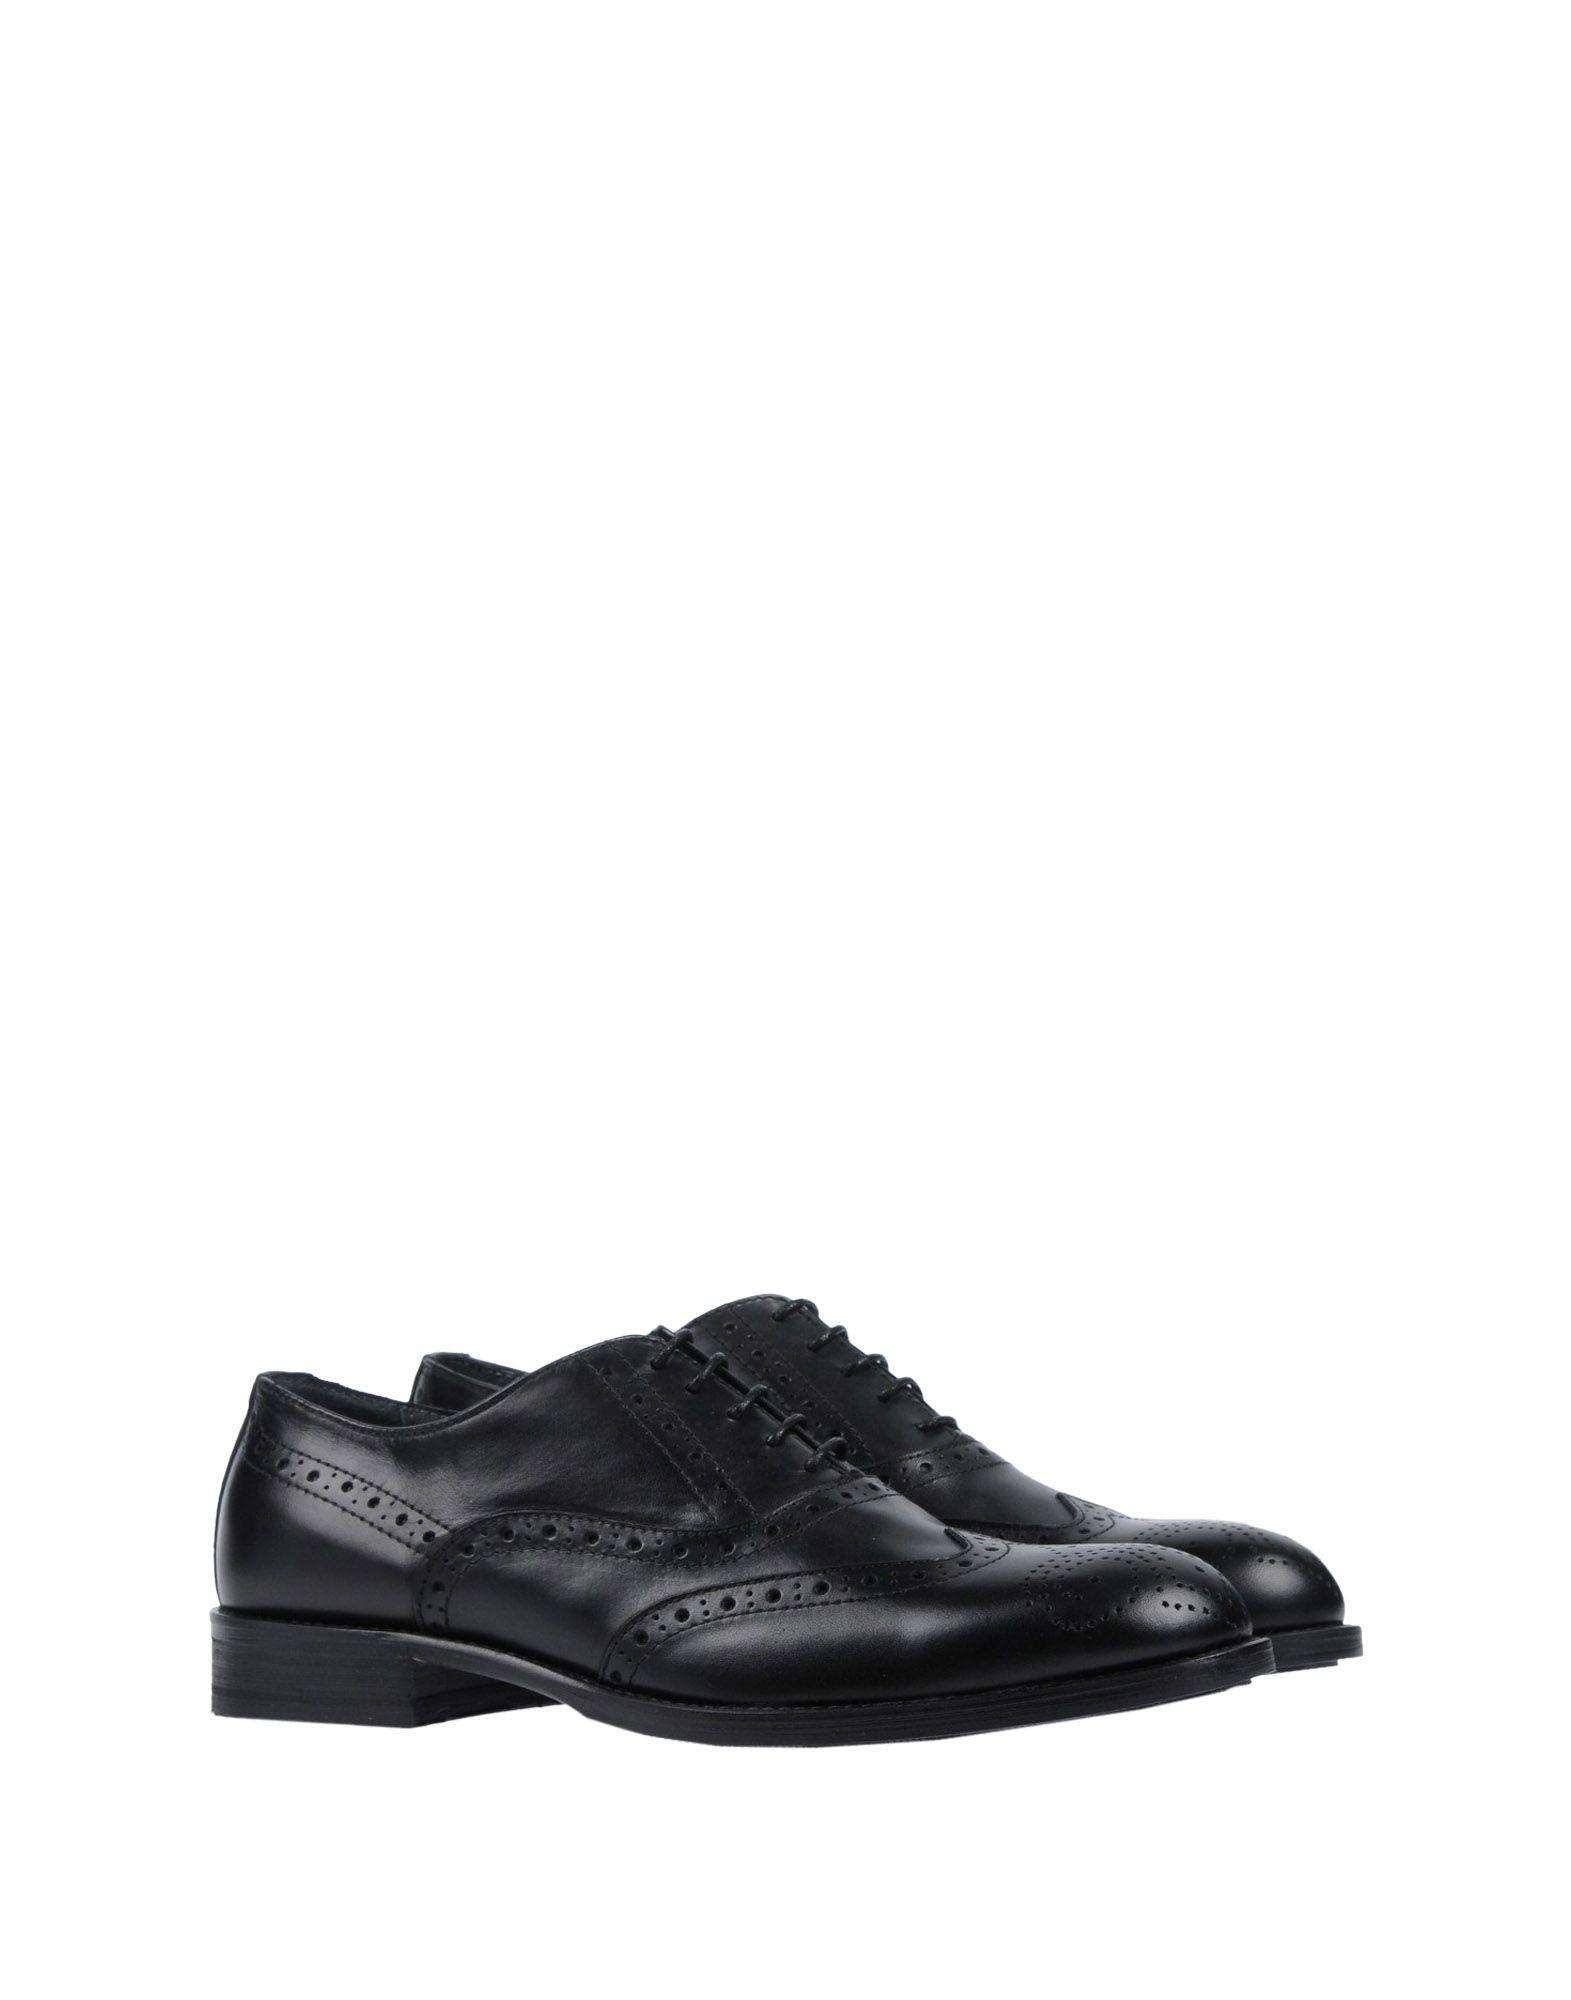 Pollini Schnürschuhe Schuhe Herren  11447589NS Heiße Schuhe Schnürschuhe b472e0